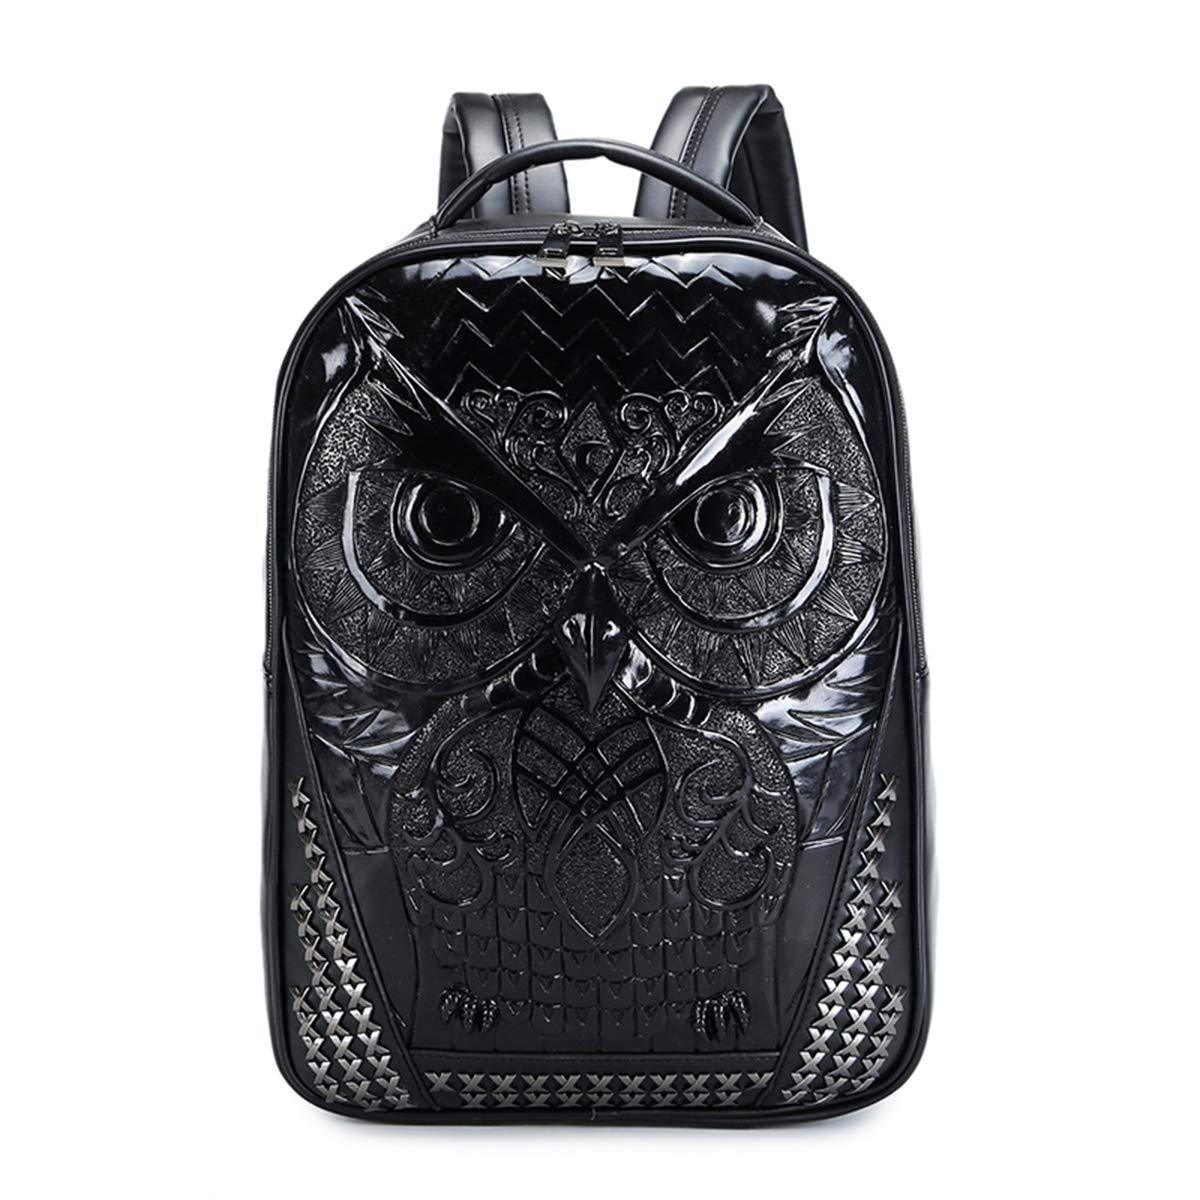 Black CHUO YUE PU Leather Men Backpack Unique Travel 3D Backpack Punk Rivet Owl Printing Motorcycle Ride Waterproof 15.6 Inch Men Laptop,Black